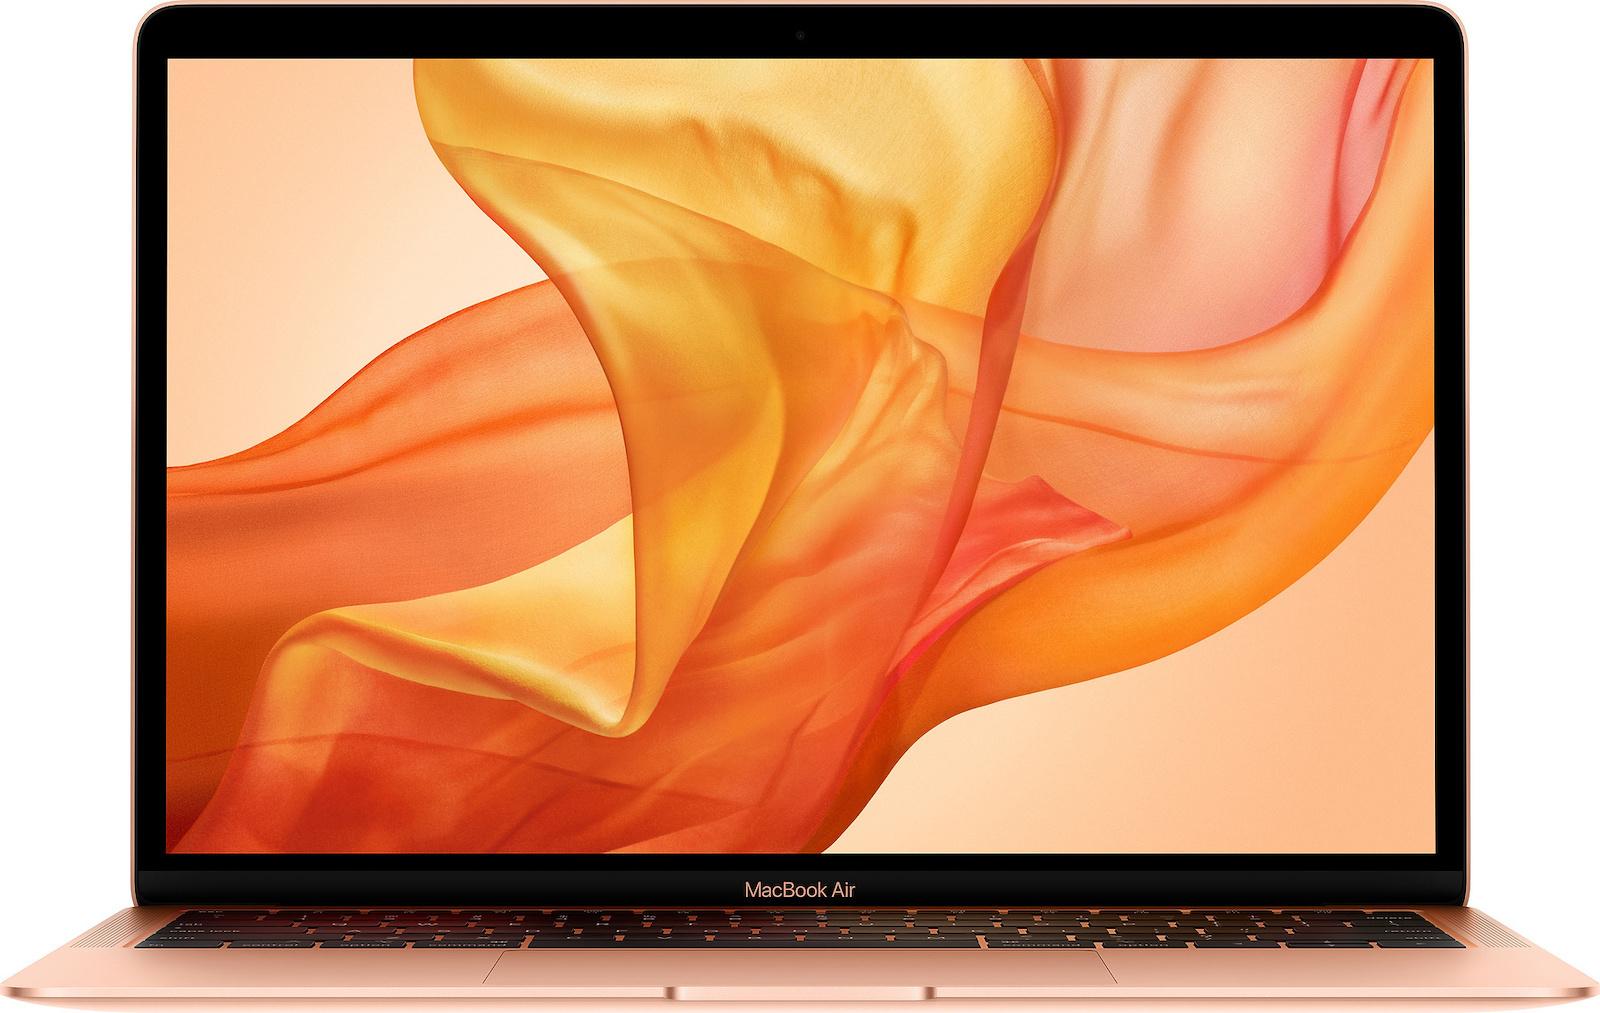 Apple MacBook Air MREF2 13.3'' 1.6GHz i5/8GB/256GB Retina 2018 Gold English Keyboard Με Αντάπτορα Πληρωμή έως 24 δόσεις